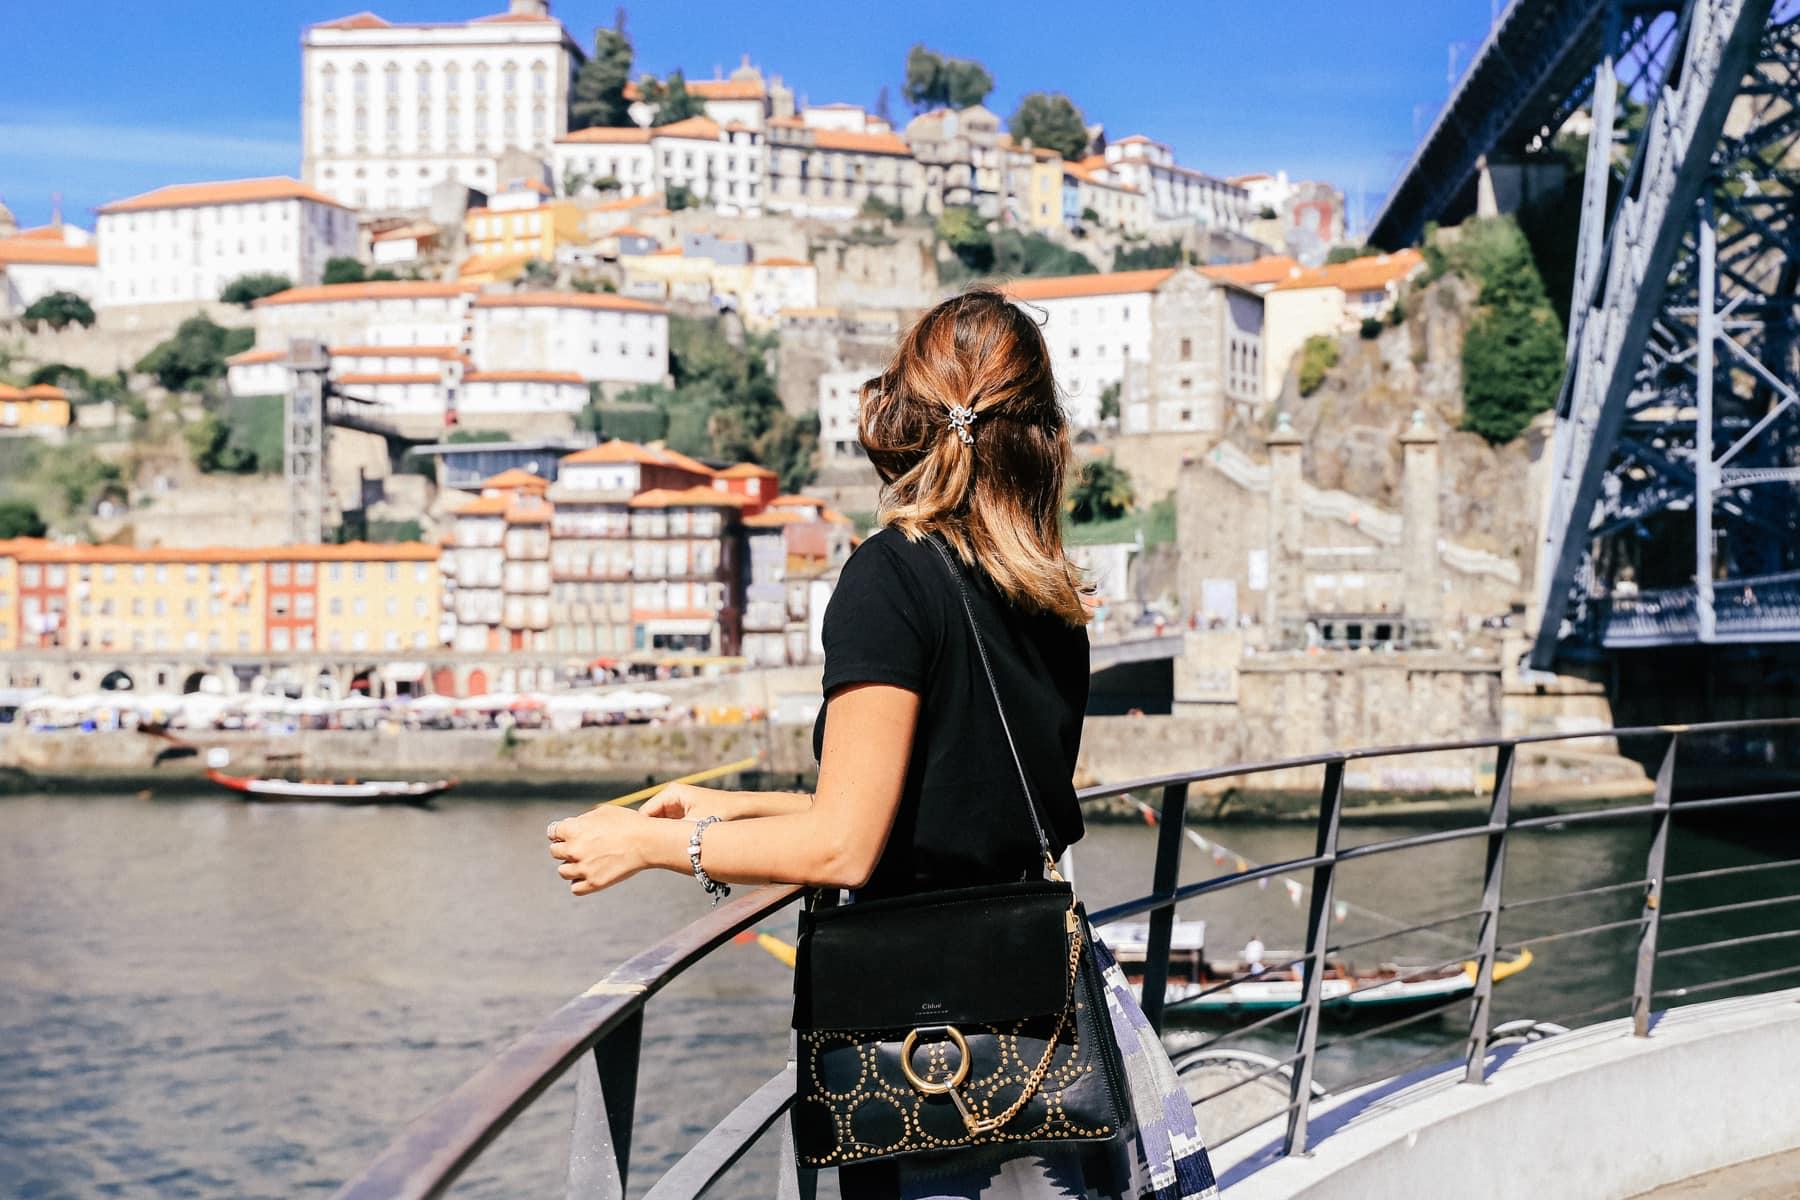 zehn-porto-tipps-fuer-deine-staedtereise-in-portugal-reiseblog-des-belles-choses 58